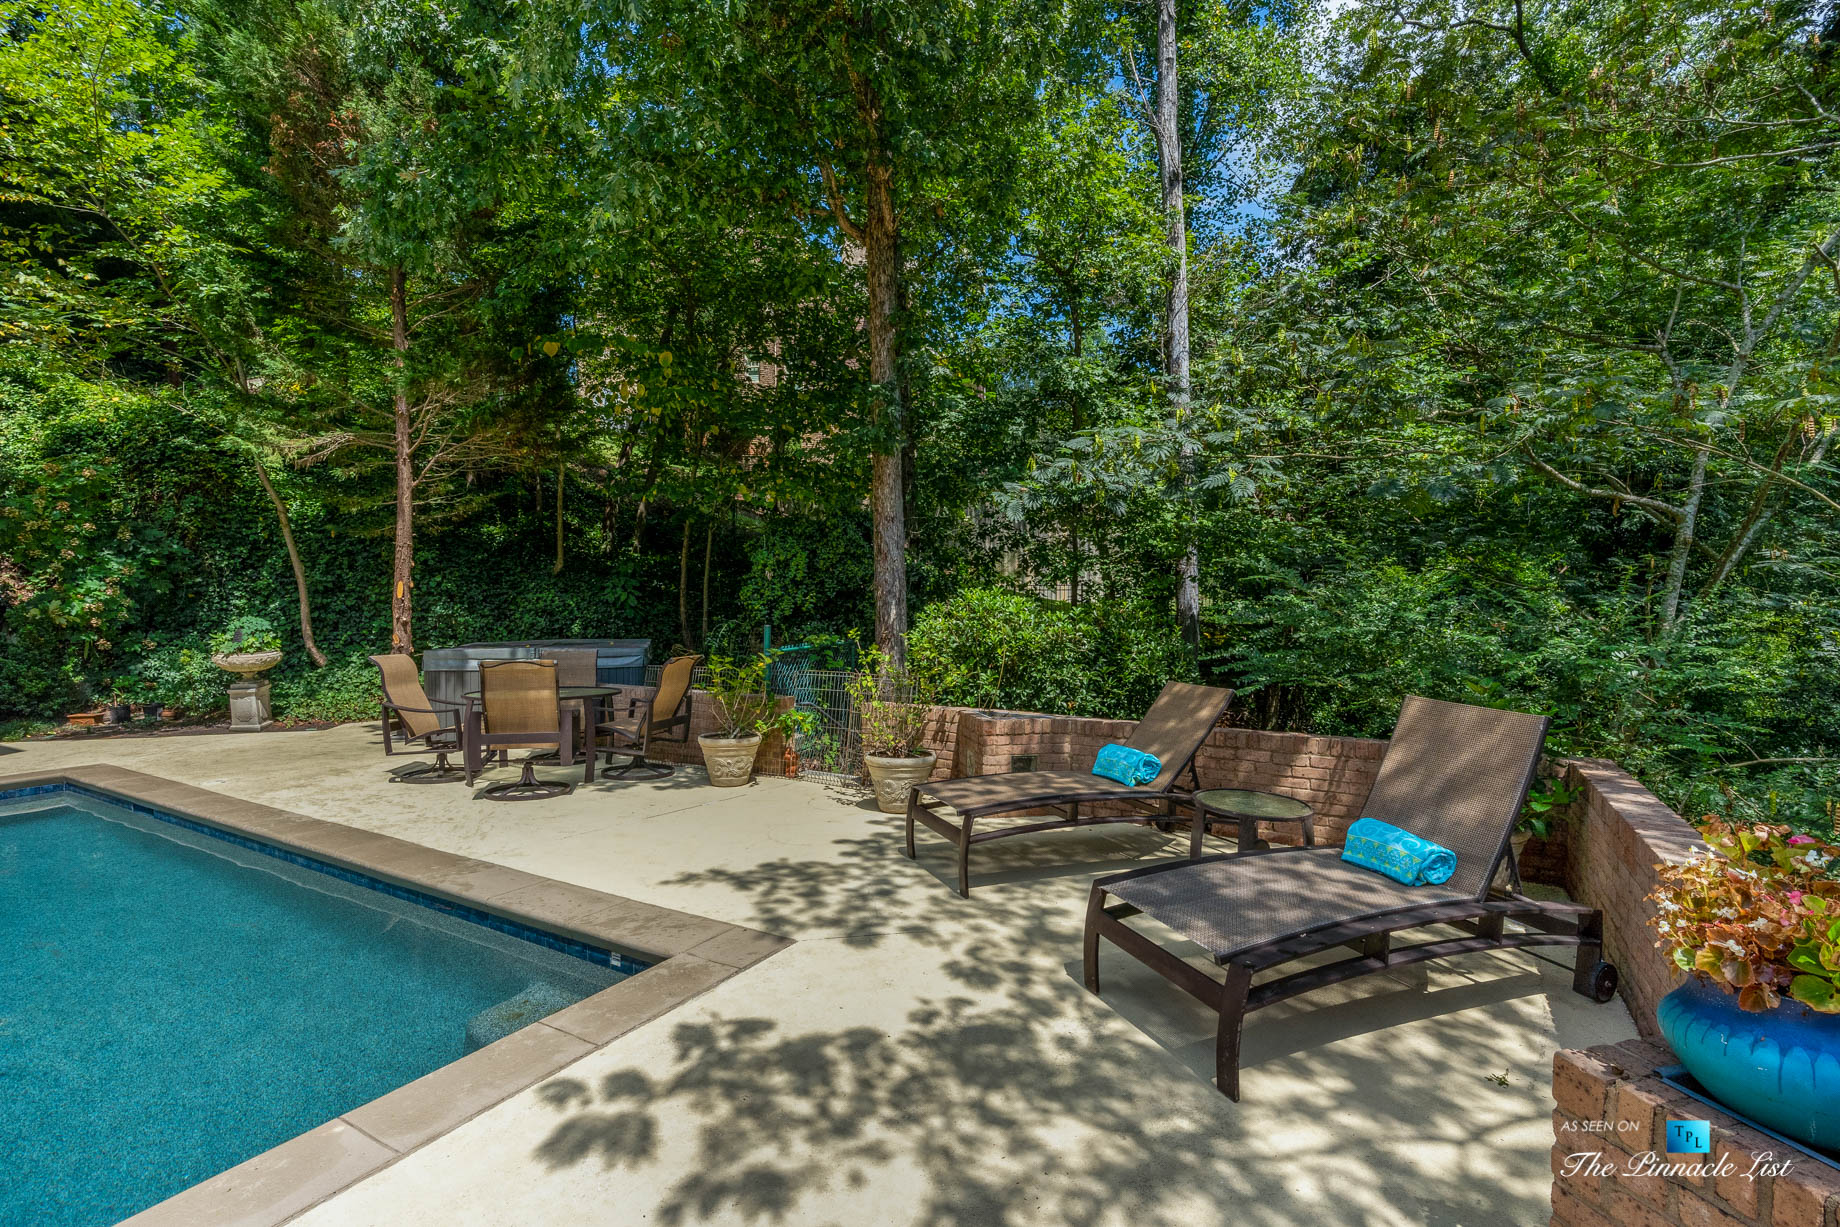 3906 Paces Ferry Rd NW, Atlanta, GA, USA – Backyard Pool Deck – Luxury Real Estate – Buckhead Home